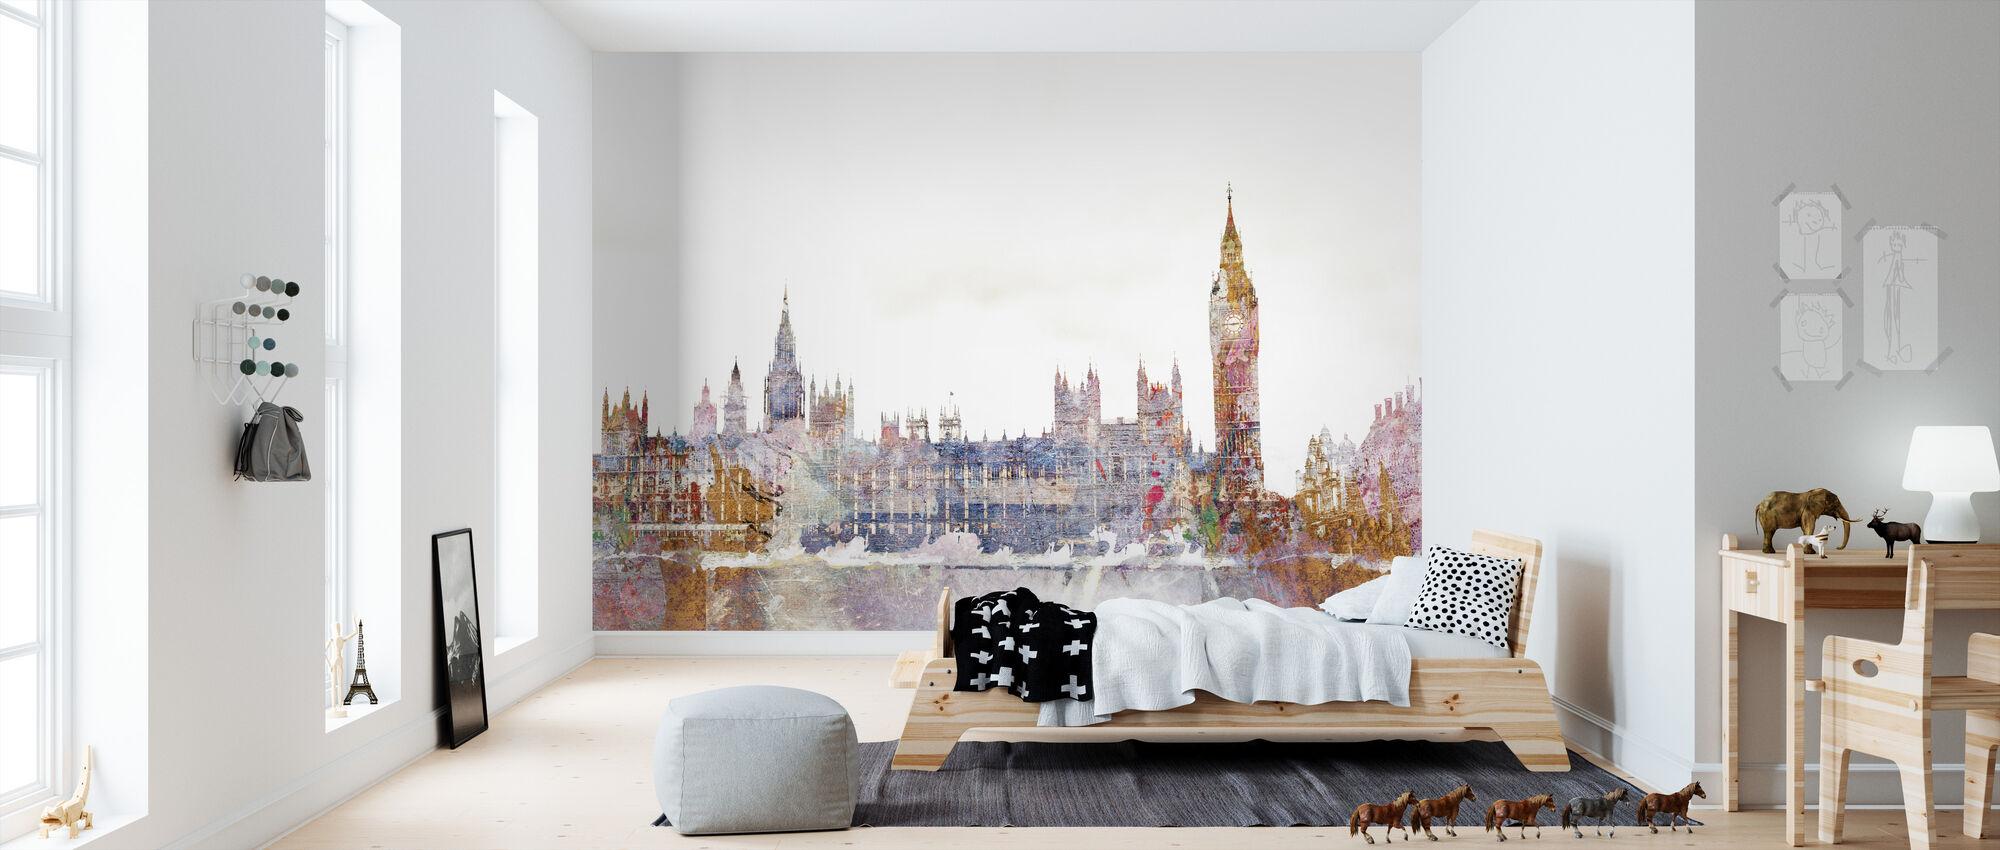 Parliament Color Splash - Wallpaper - Kids Room